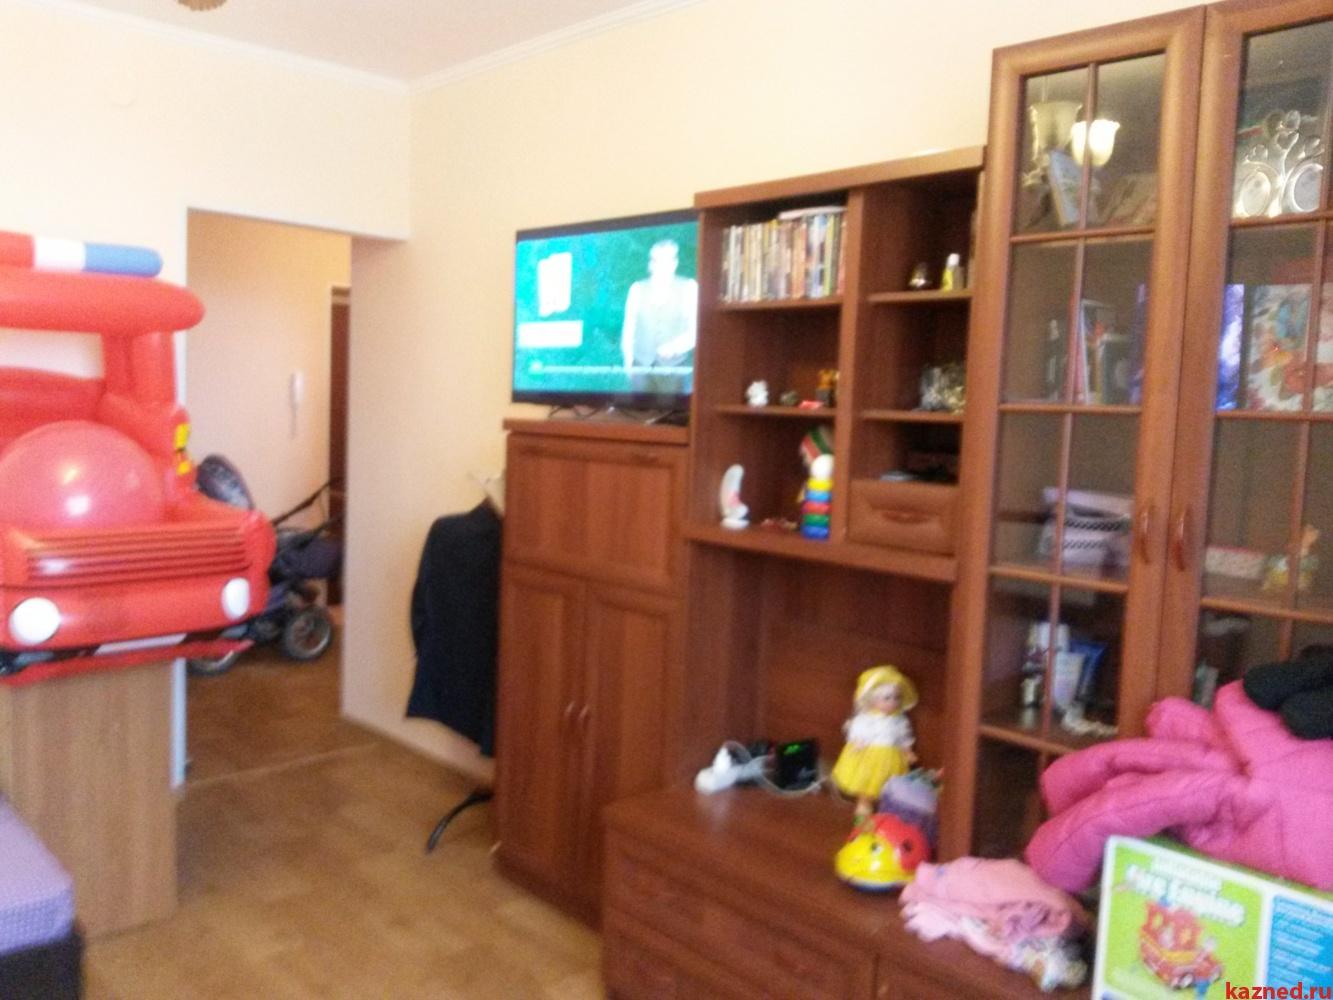 Продажа 1-к квартиры Ю.Фучика, 14В, 46 м2  (миниатюра №2)